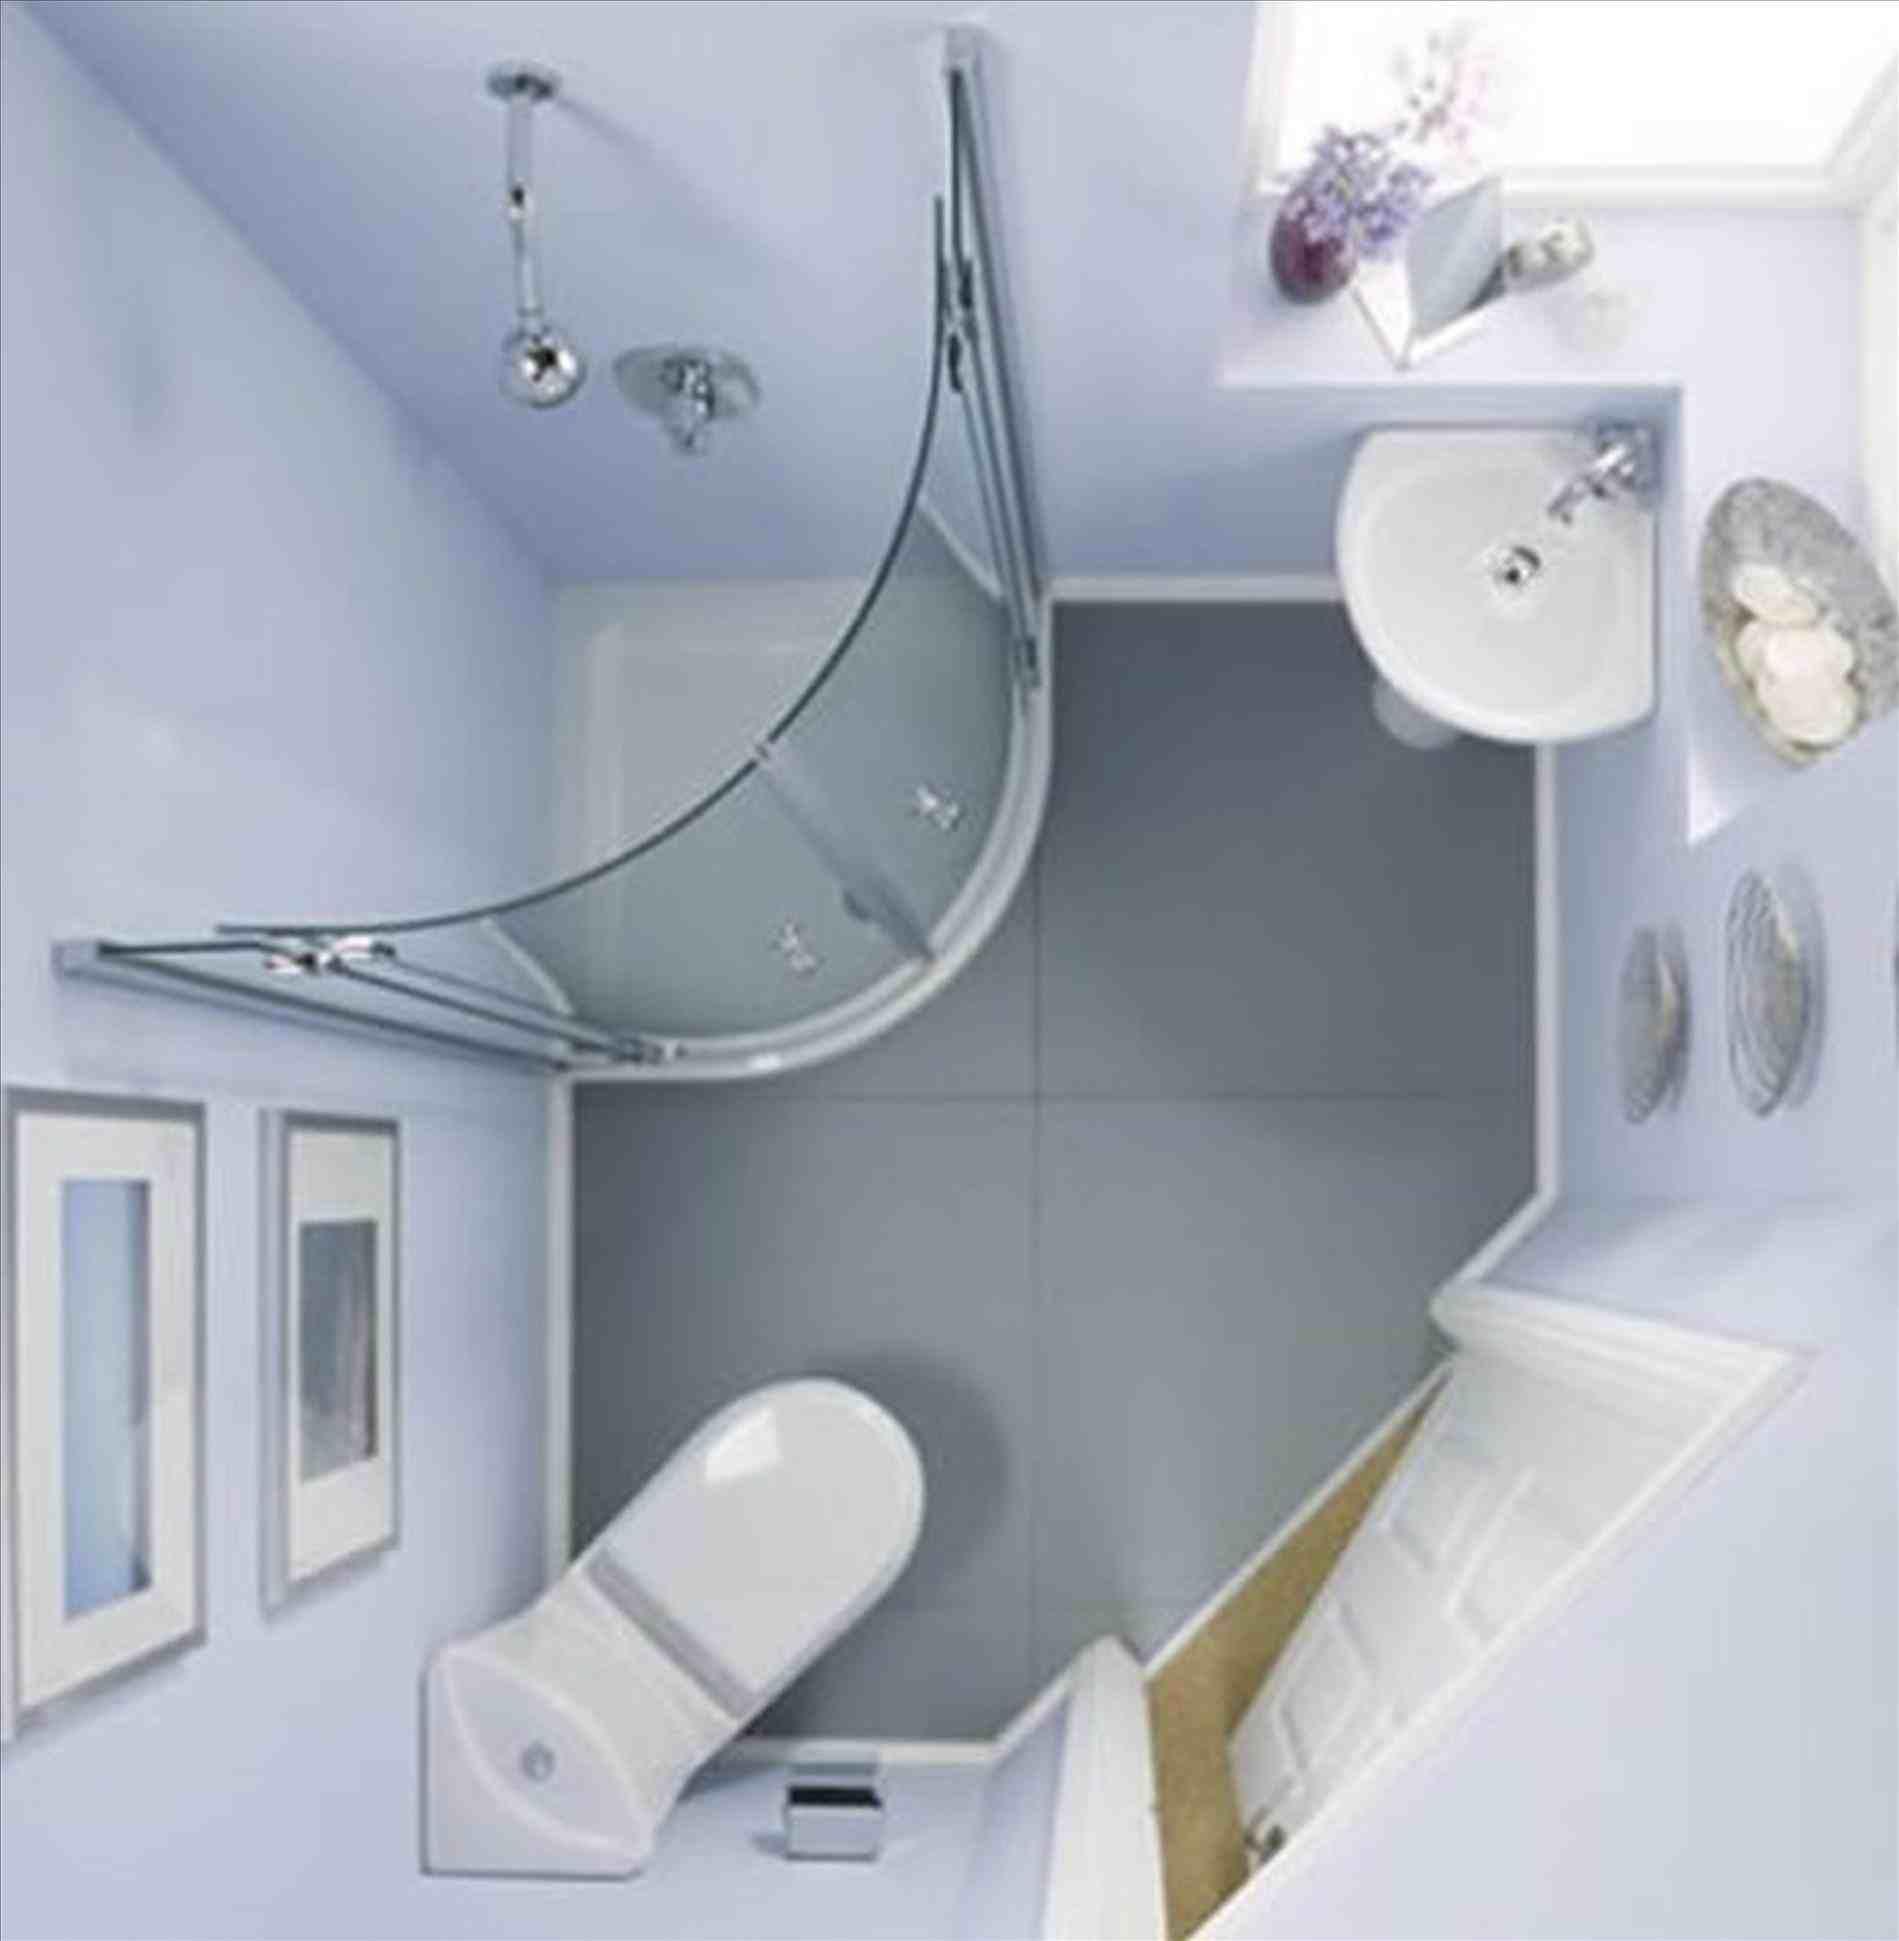 This Very Small Narrow Bathroom Ideas Image Of Simple Narrow Bathroom Vanity Full Size Of Bathroom De Small Space Bathroom Small Shower Room Small Bathroom